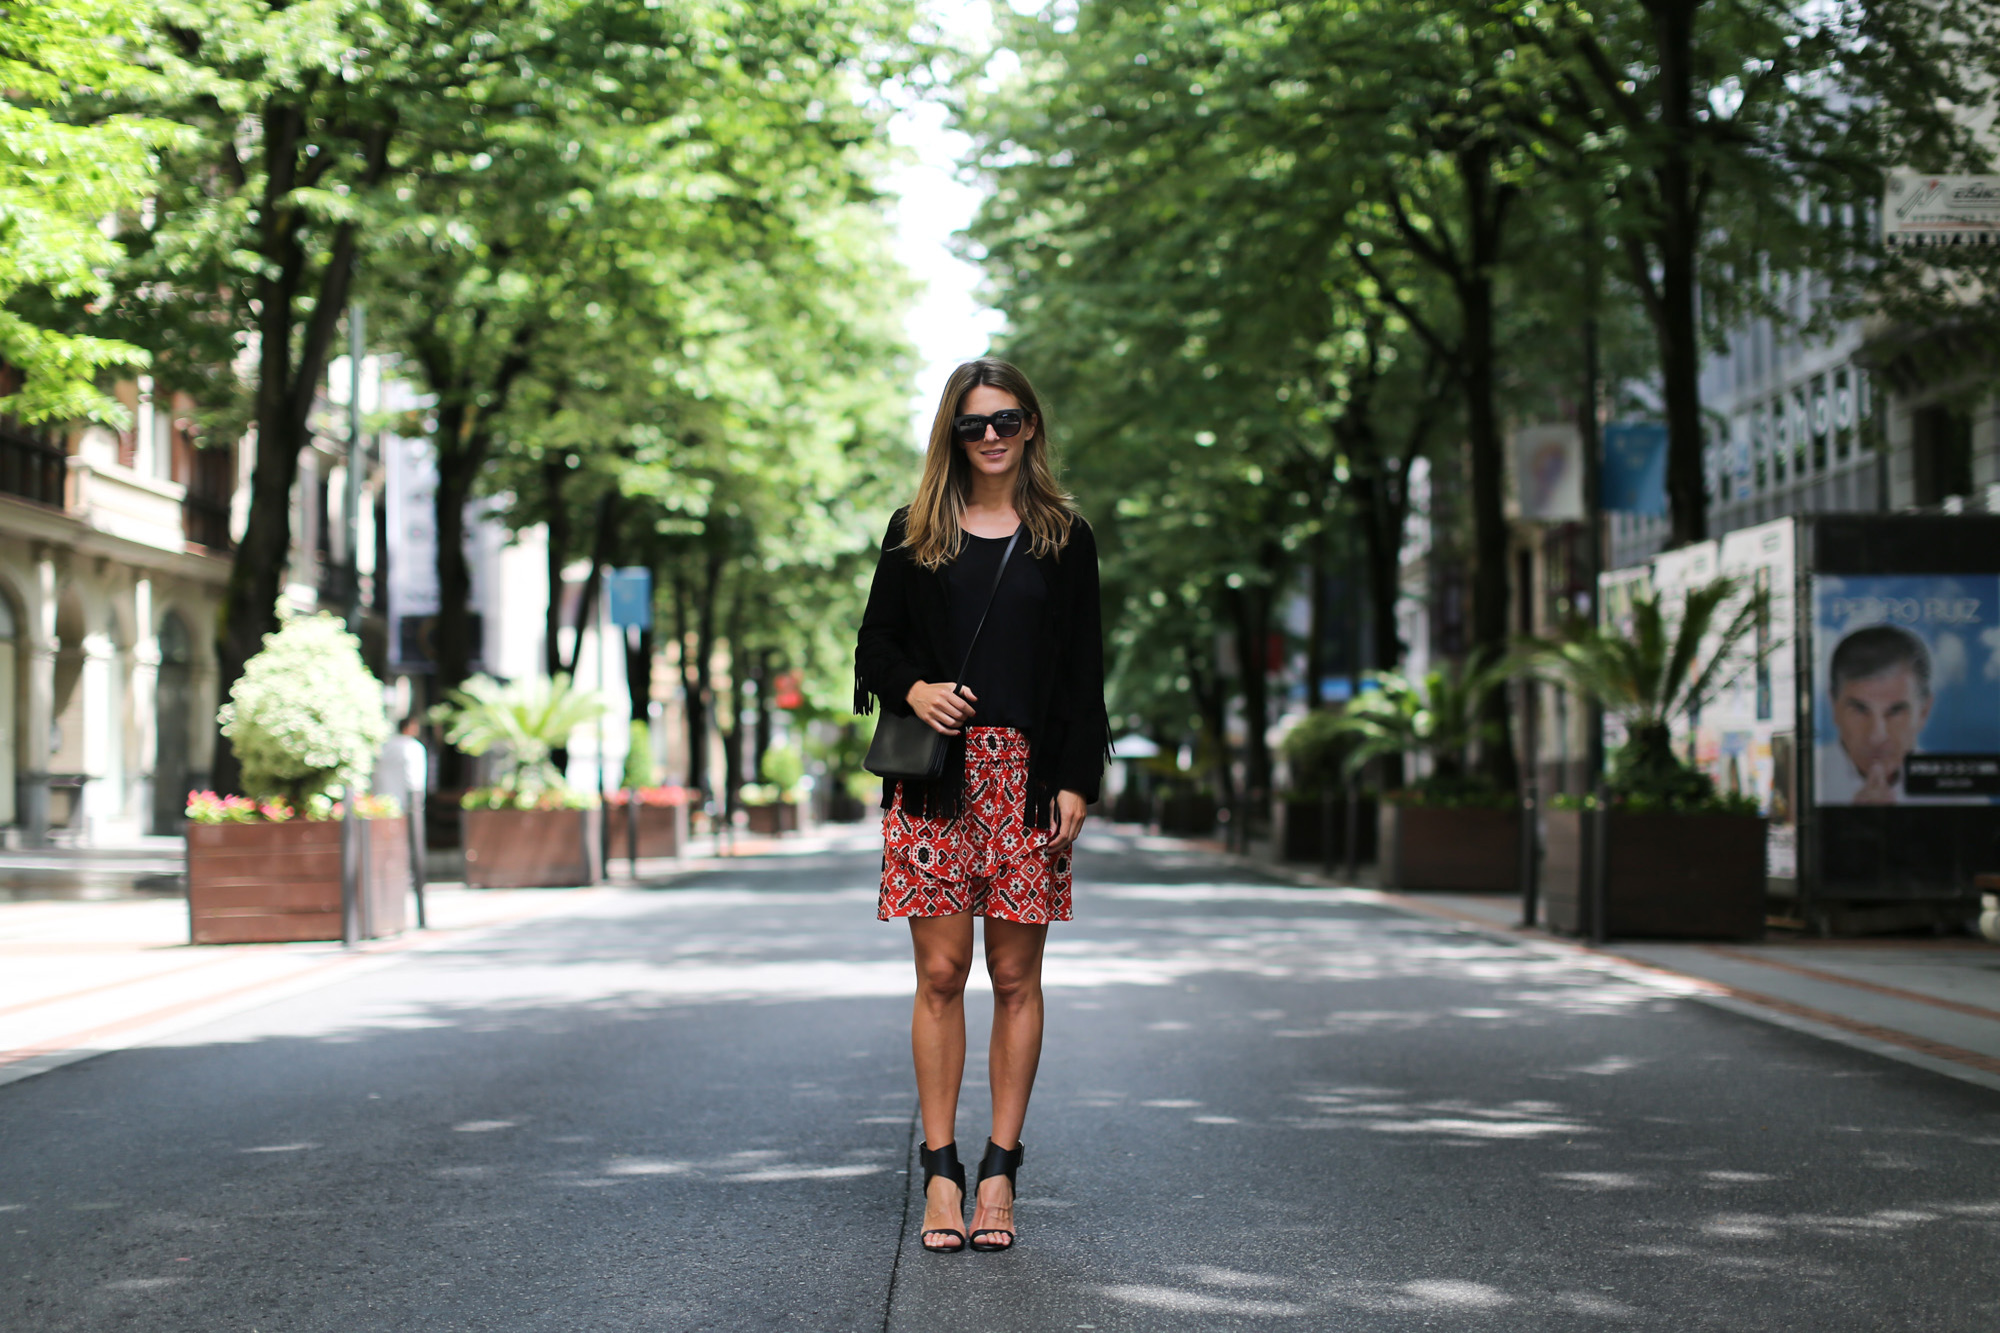 clochet_streetstyle_maje_suede-fringedjacket_hakeisilkskirt_celine_sunglasses-4